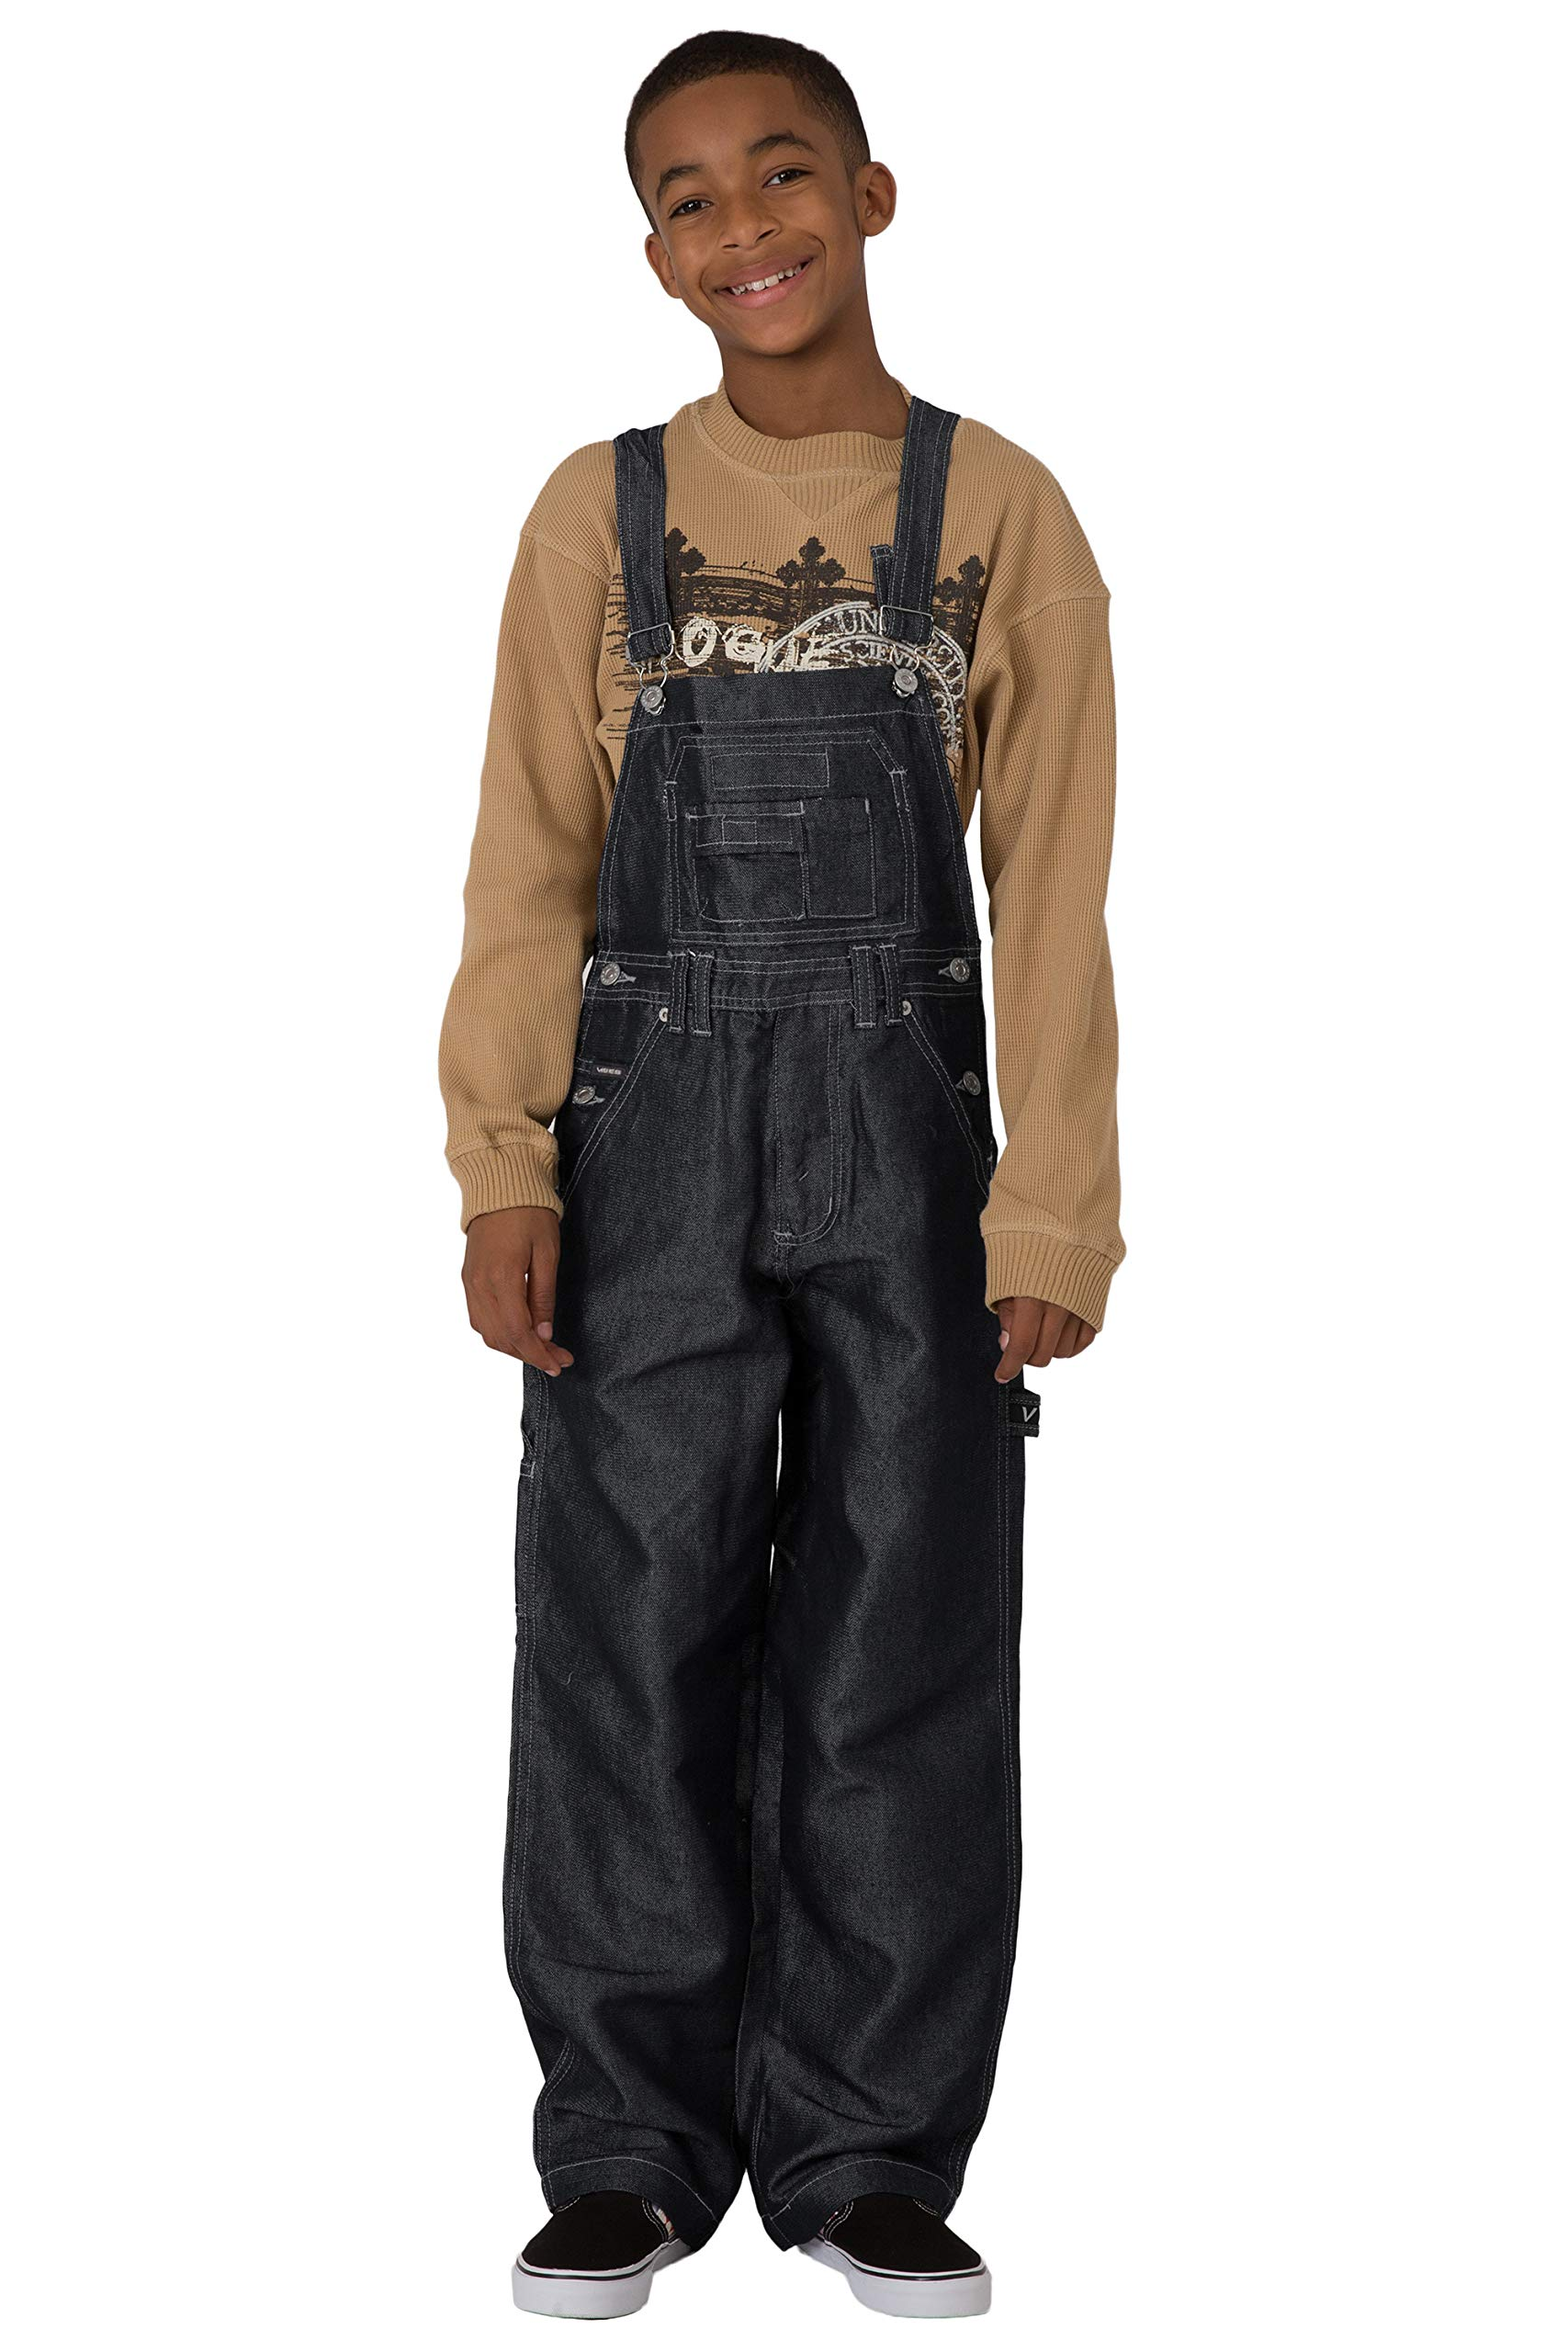 Vibes Boy's Black Shiny Denim Carpenter Overalls Relax Fit Size M